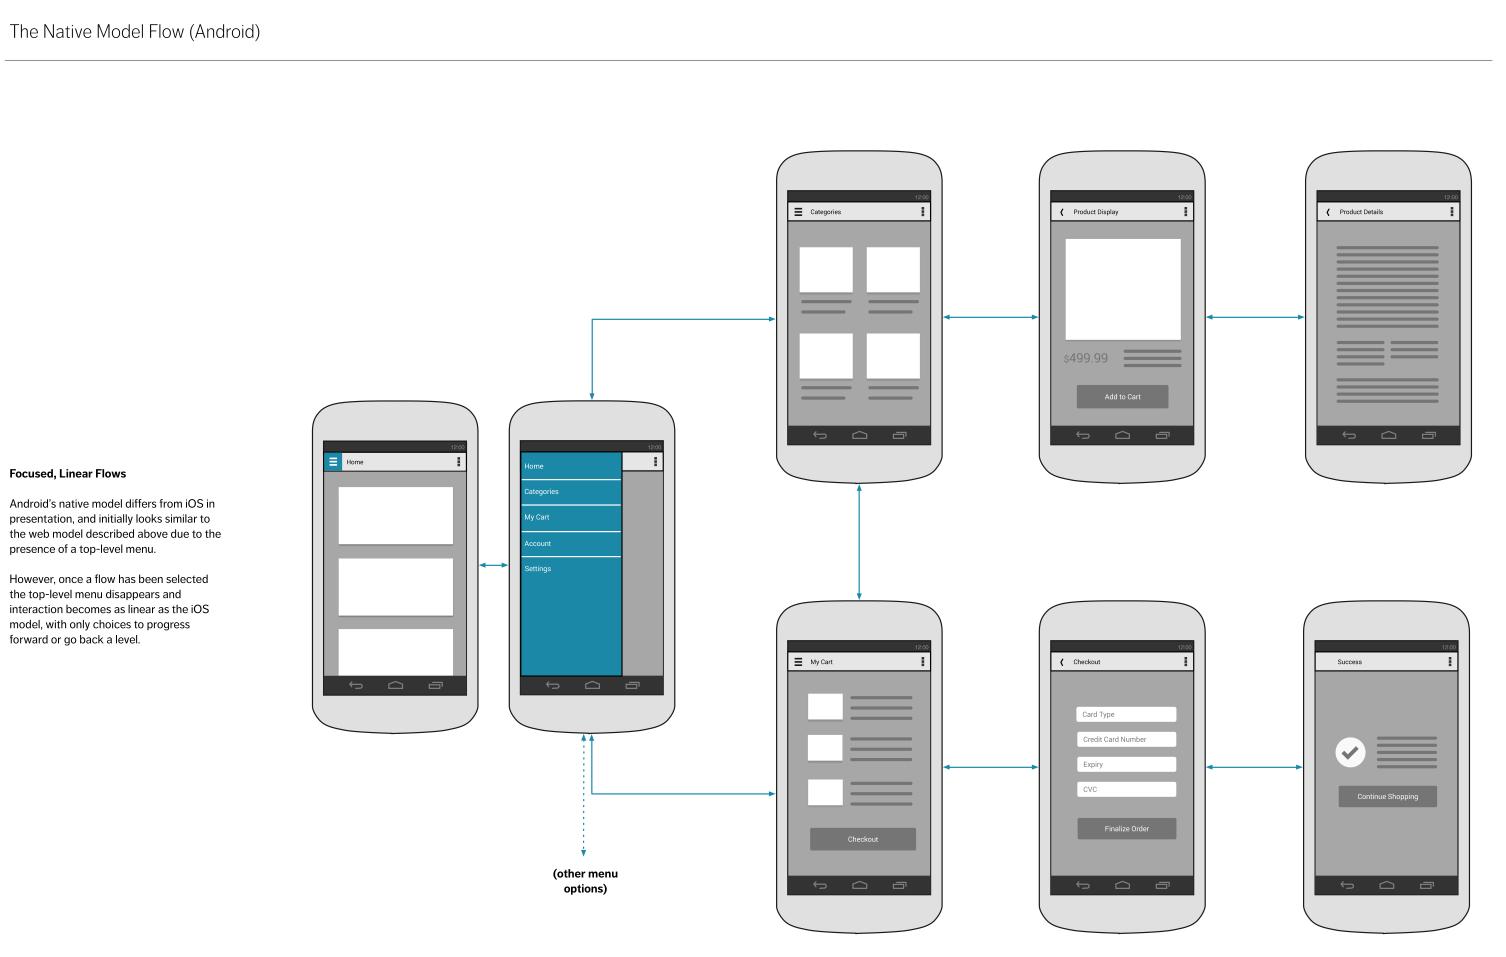 Ios native interaction model flow diagram personal favs websites ios native interaction model flow diagram ccuart Choice Image